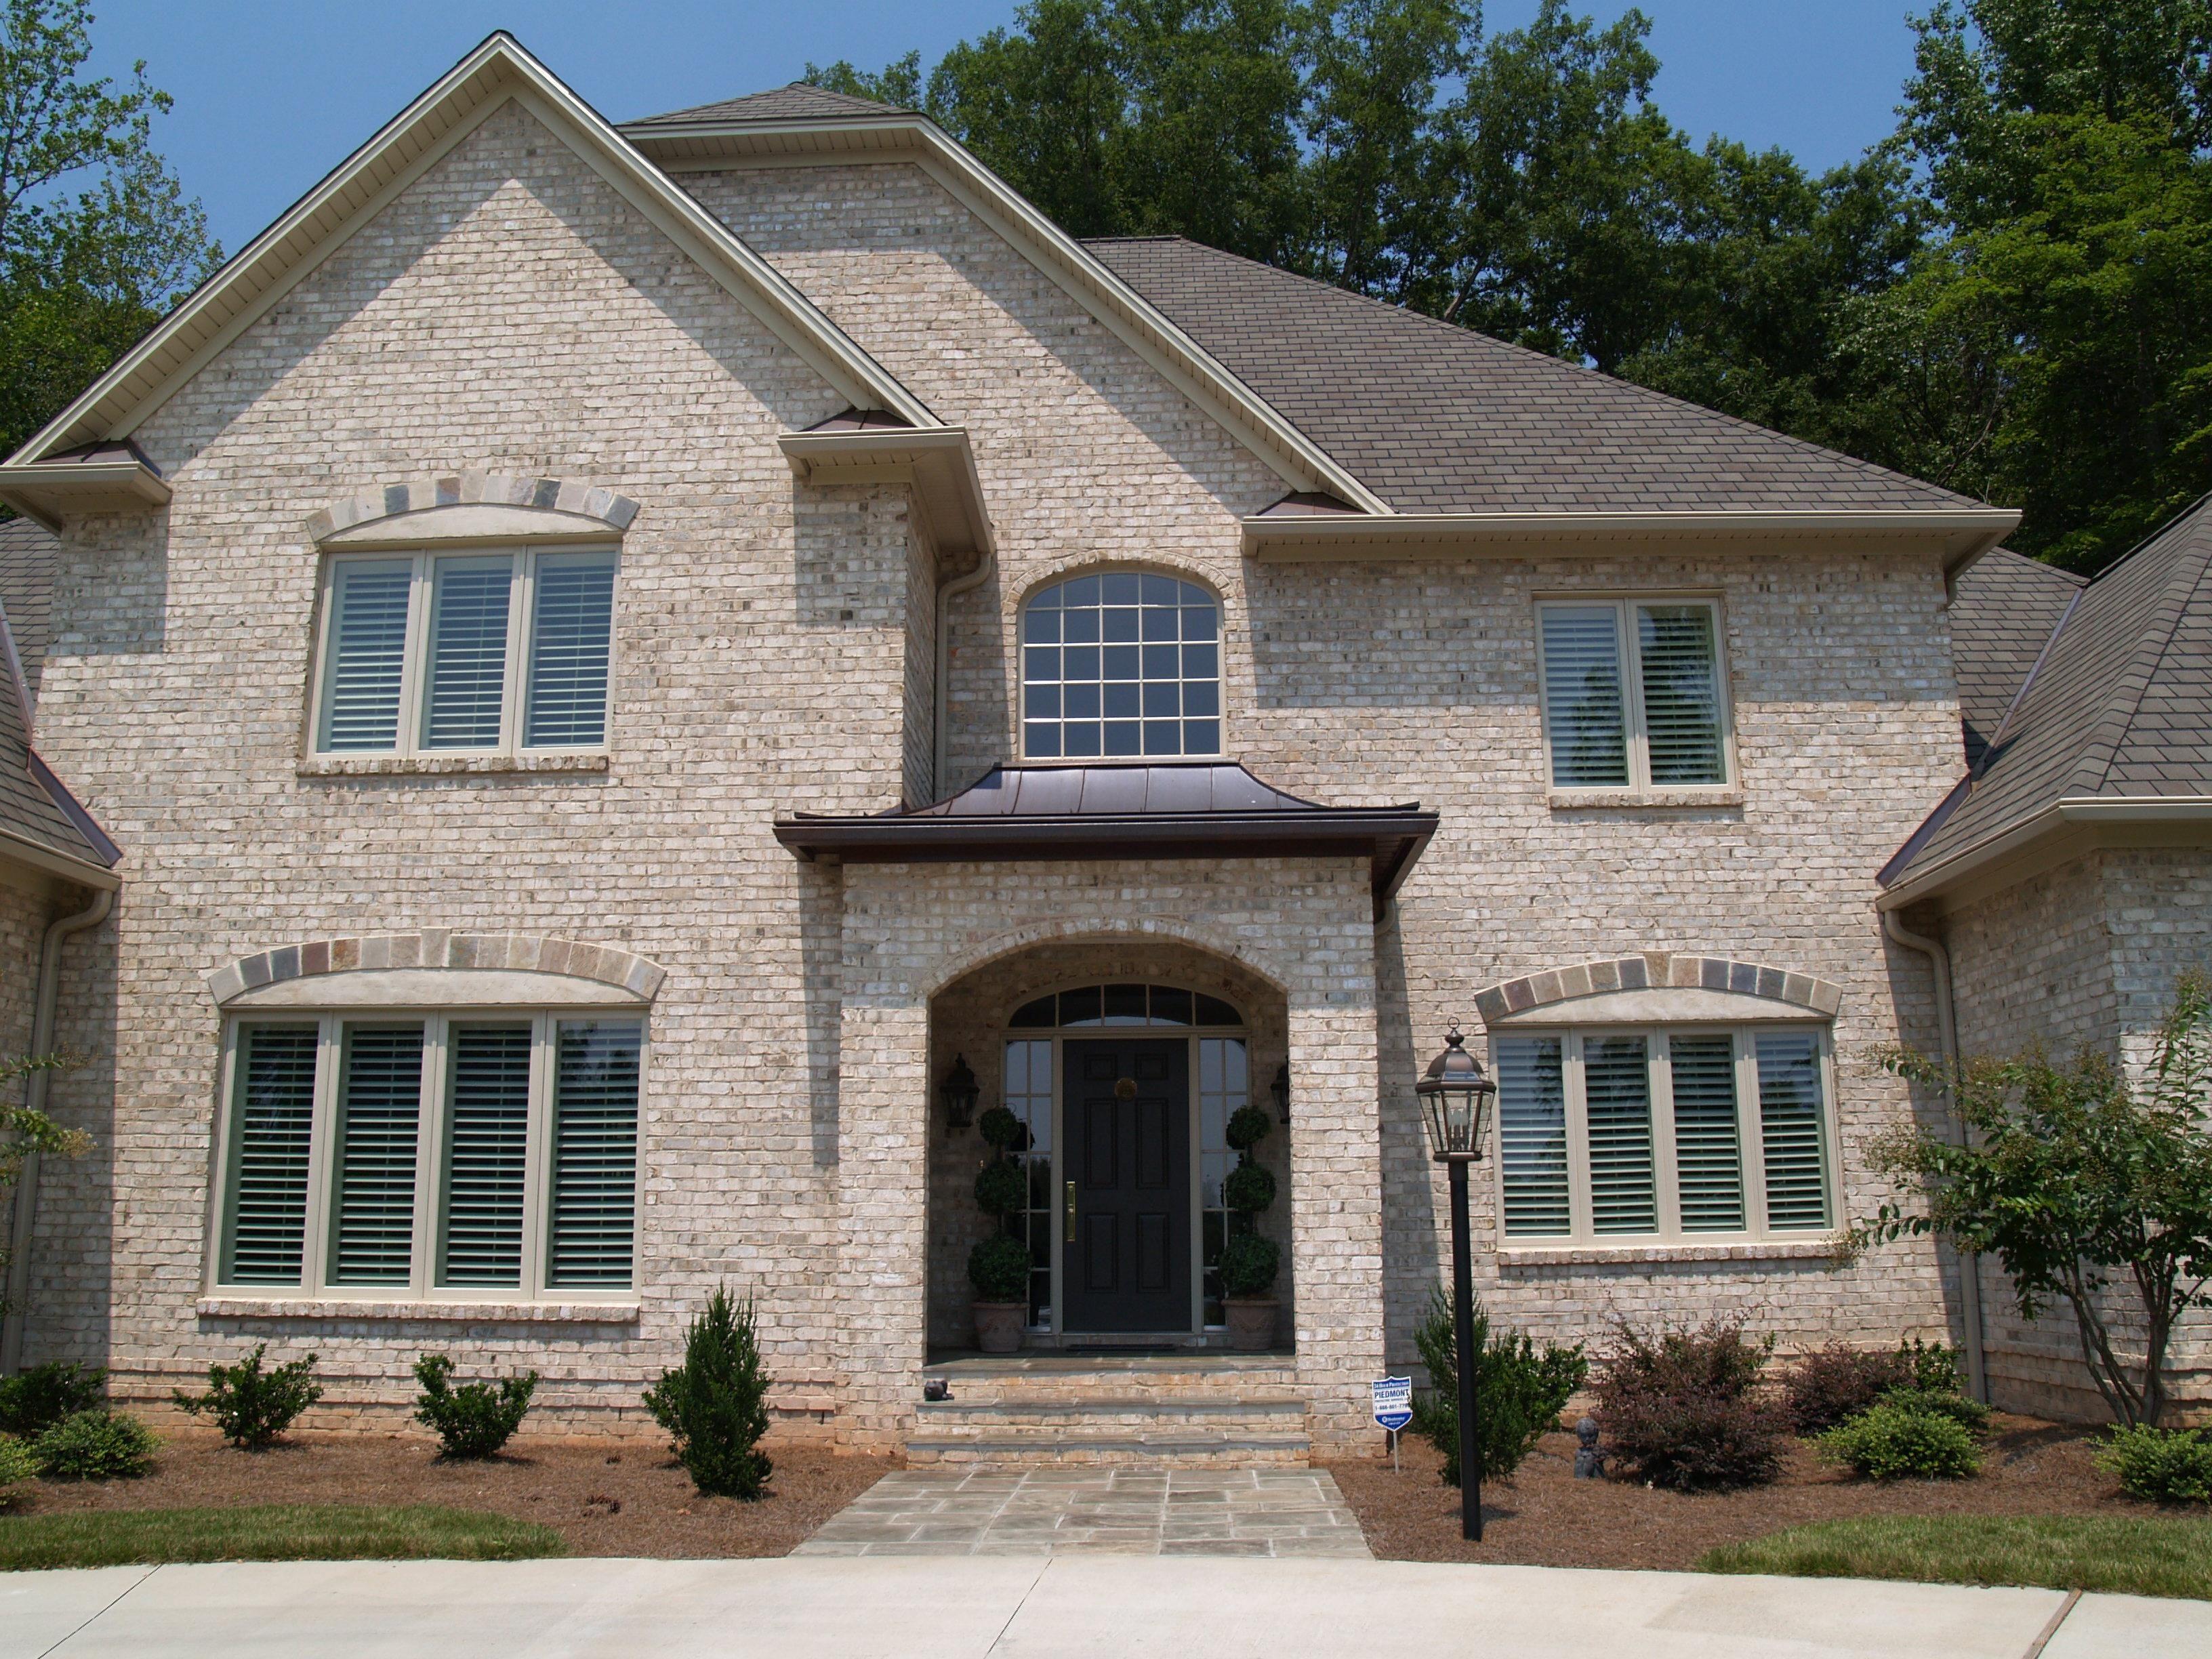 Home Made Of Pine Hall Brick 39 S Chesapeake Pearl Oversize